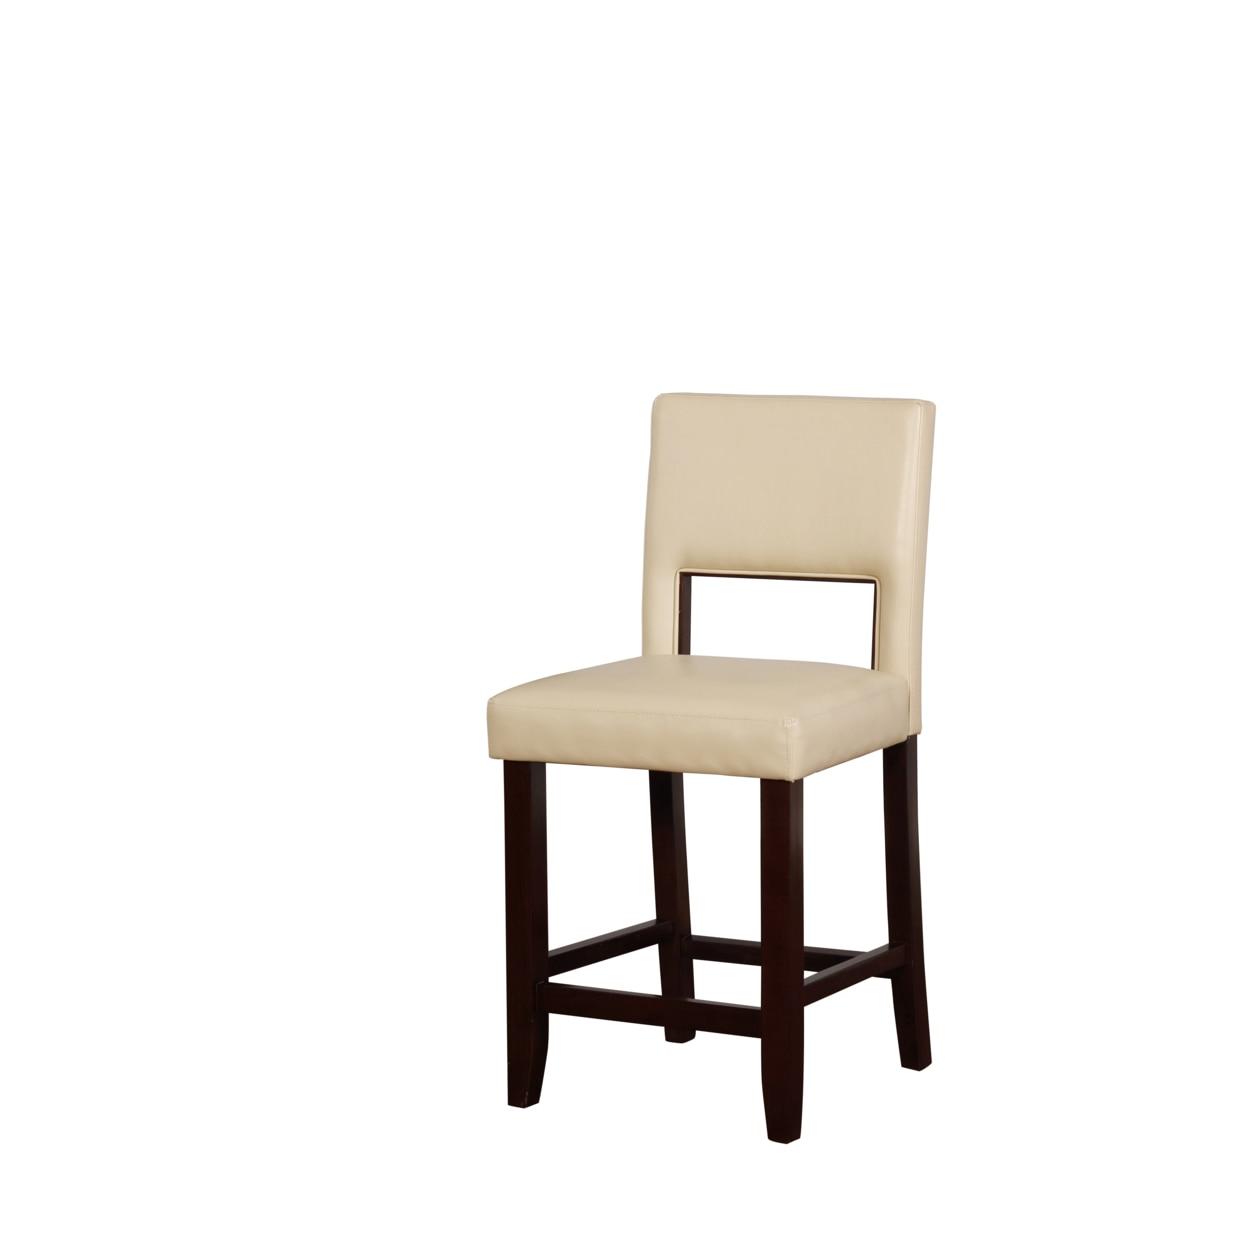 Velma Camel Counter Stool catina counter stool charcoal